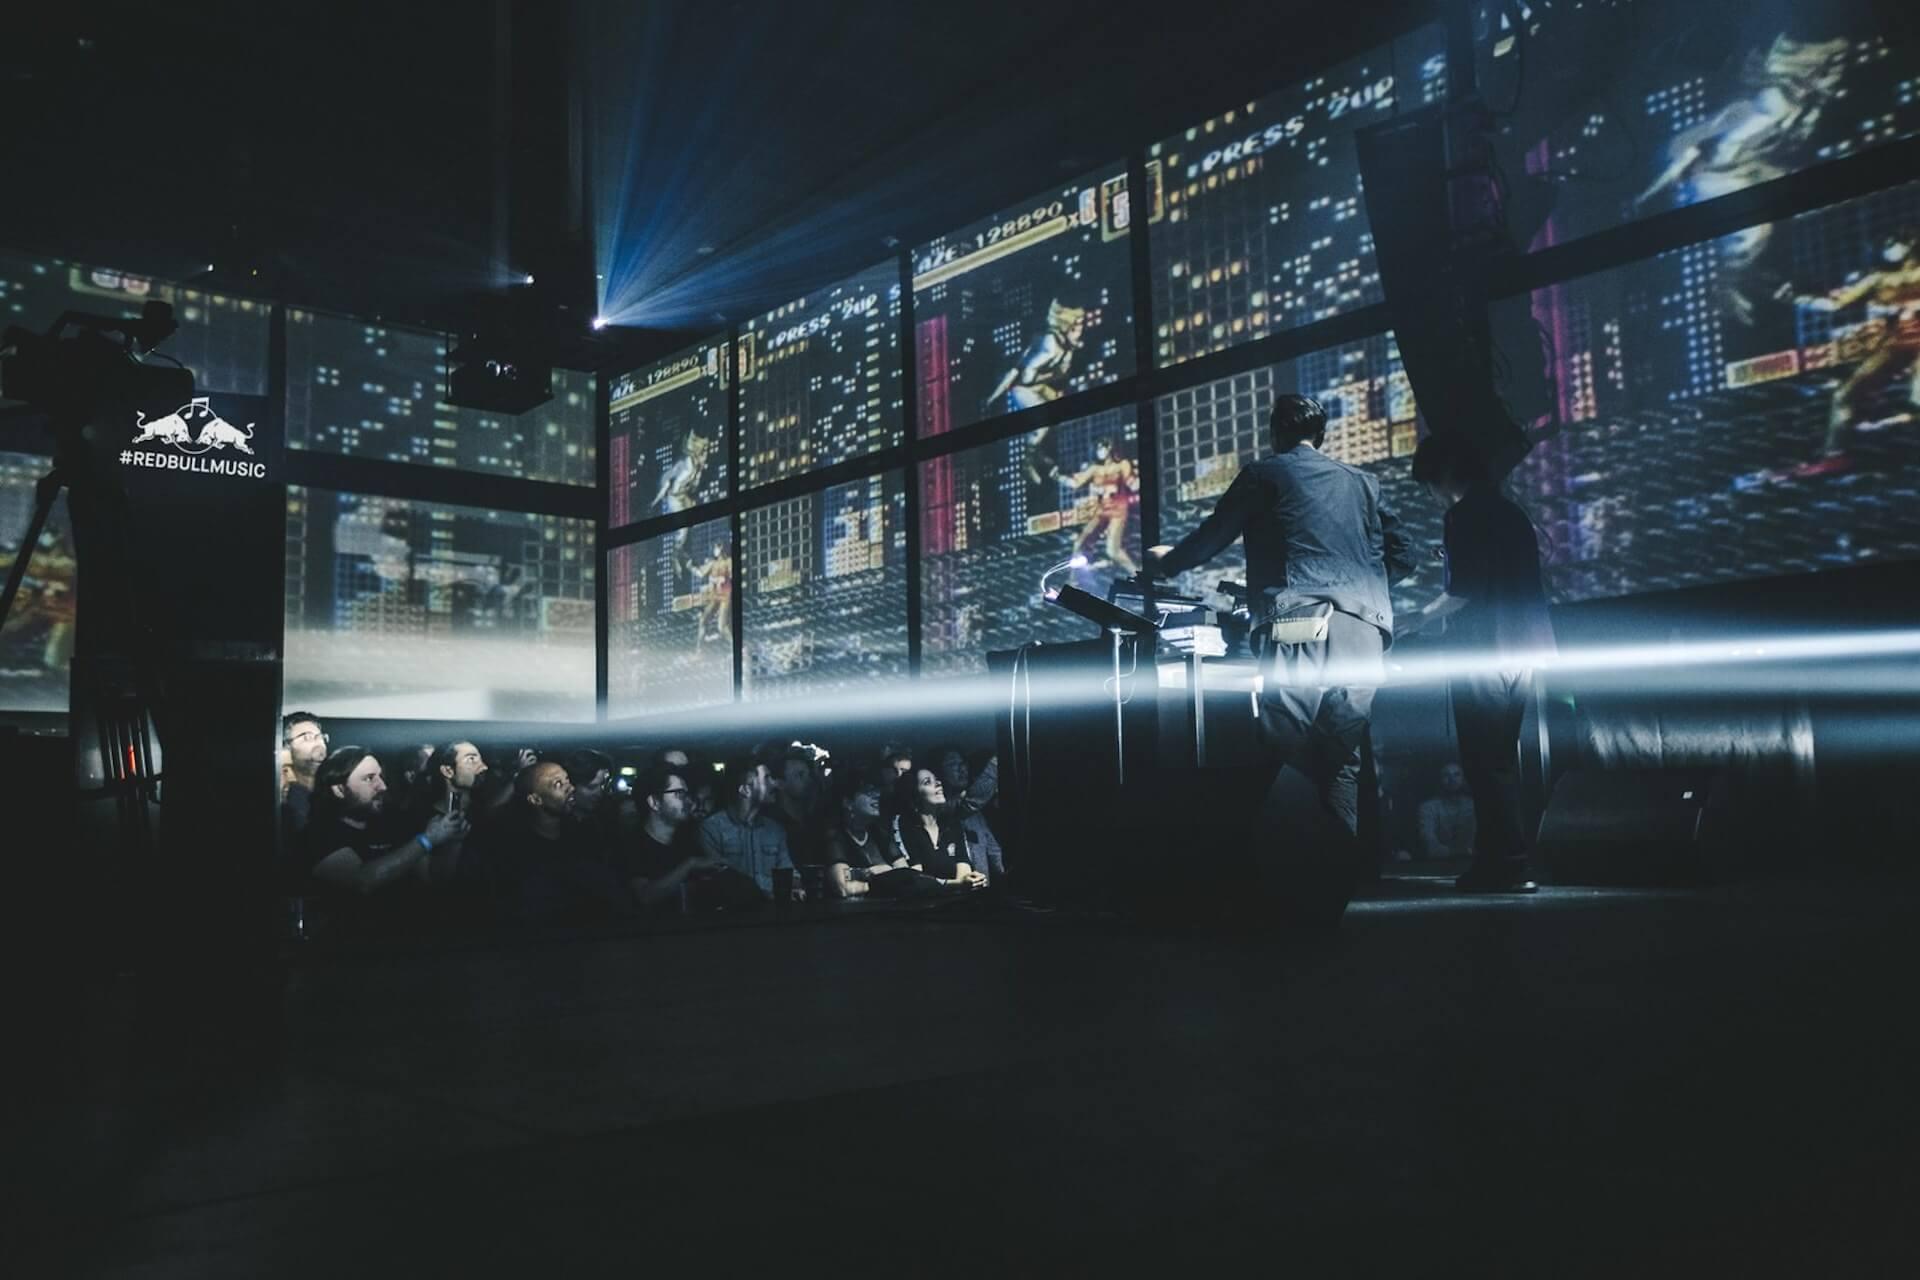 <MUTEK.JP 2019>の第一弾ラインアップにKode9&森本晃司、Tim Hecker、真鍋大度、中山晃子らが発表 music190926-mutek-8